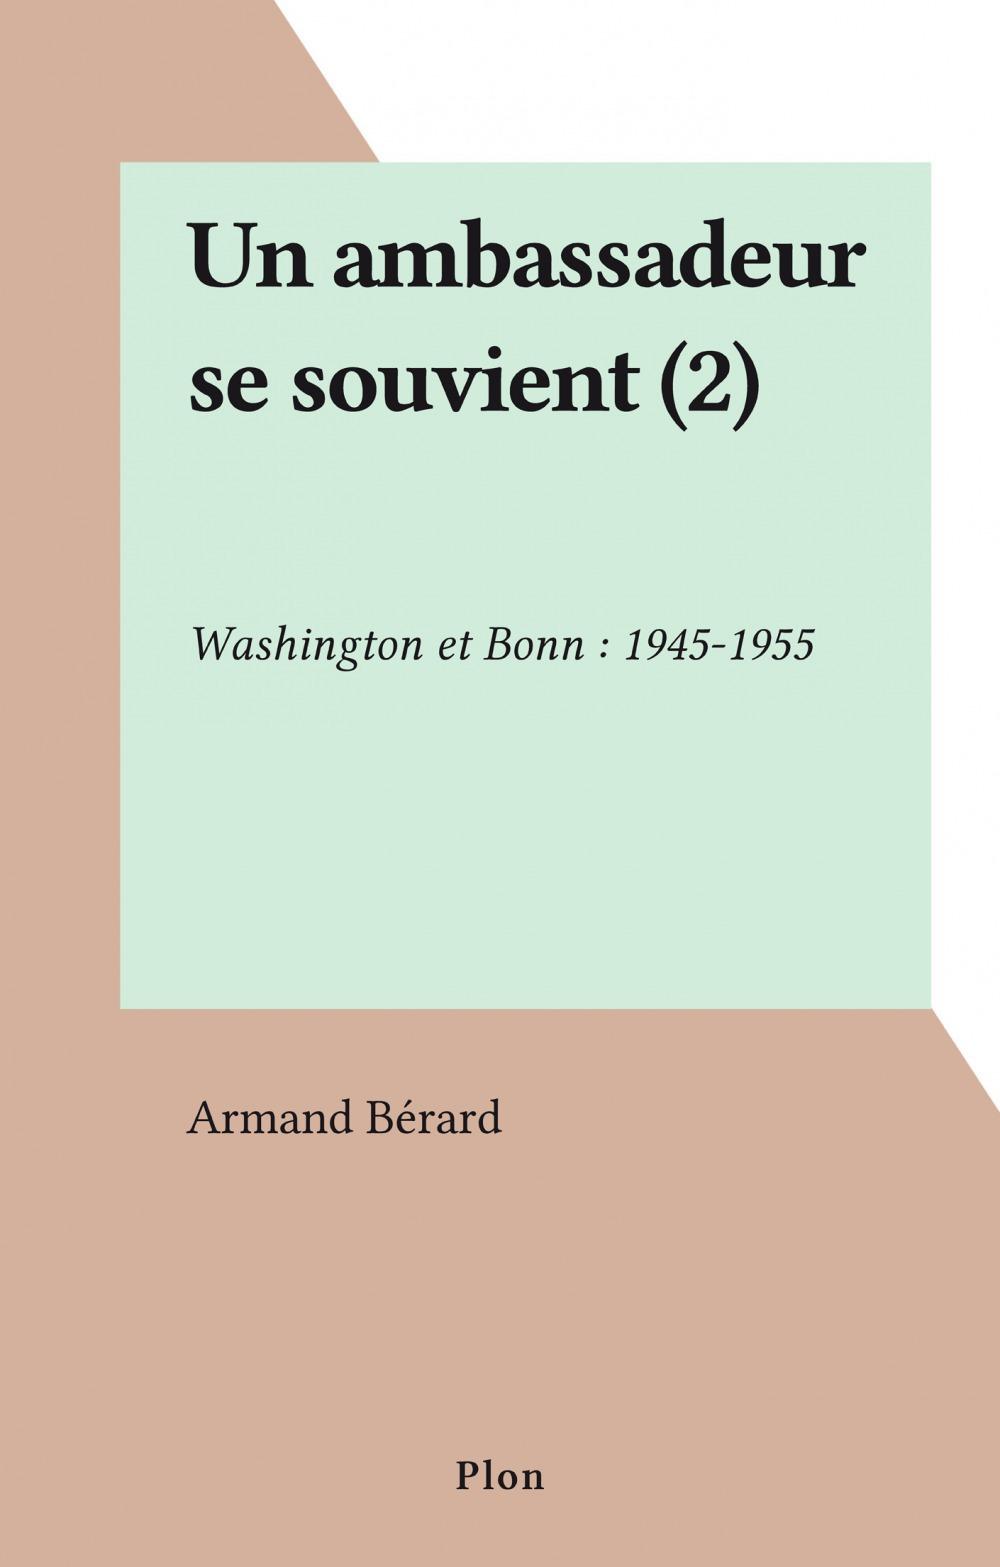 Un ambassadeur se souvient (2)  - Armand Berard